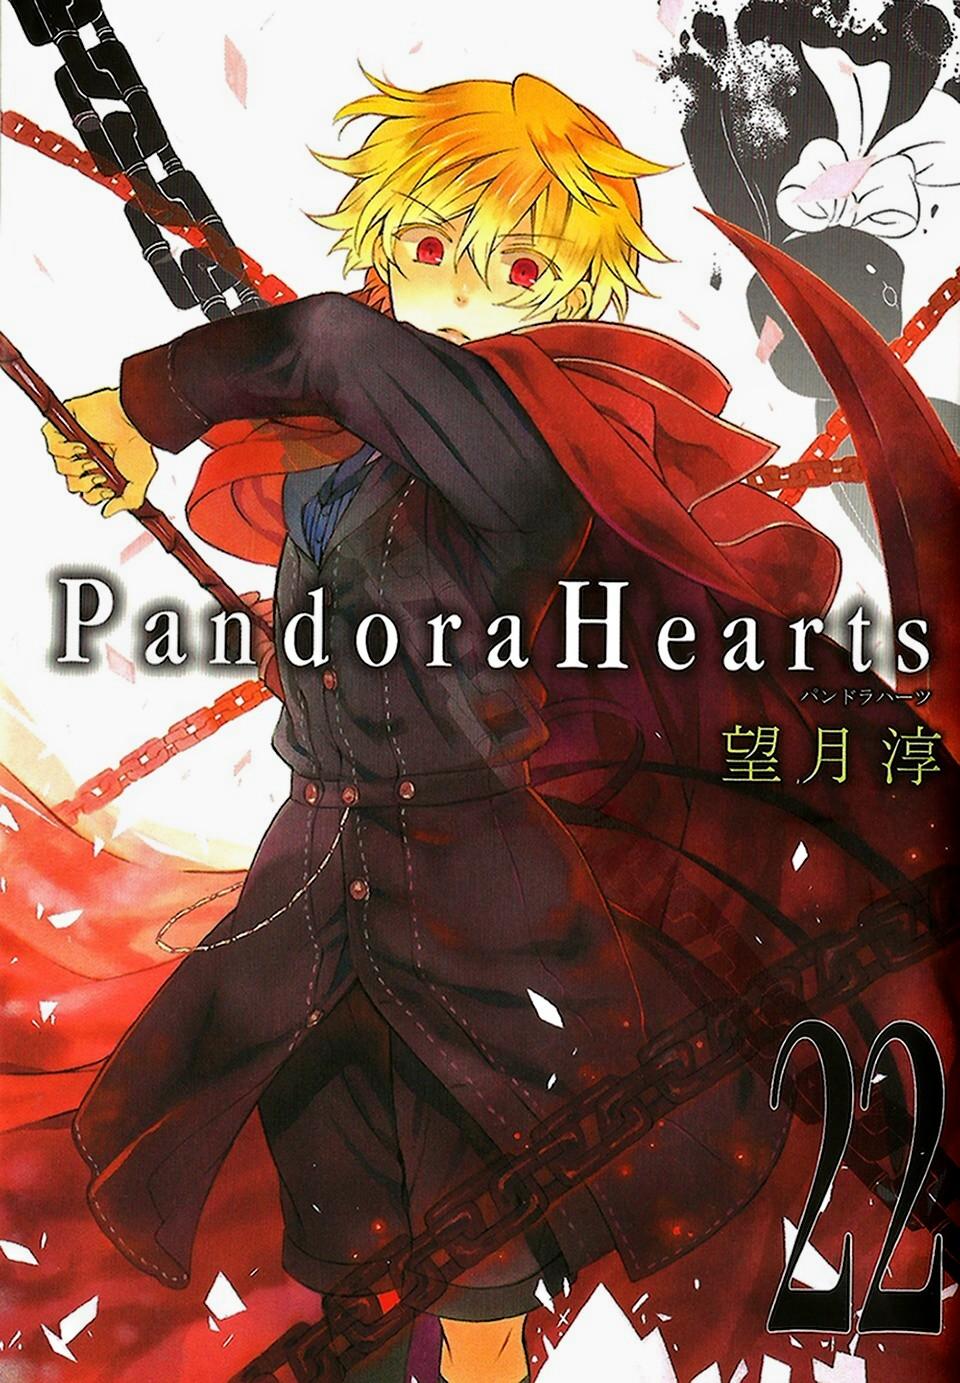 5 Rekomendasi Manga Dark Fantasy yang Wajib Kamu Baca 3